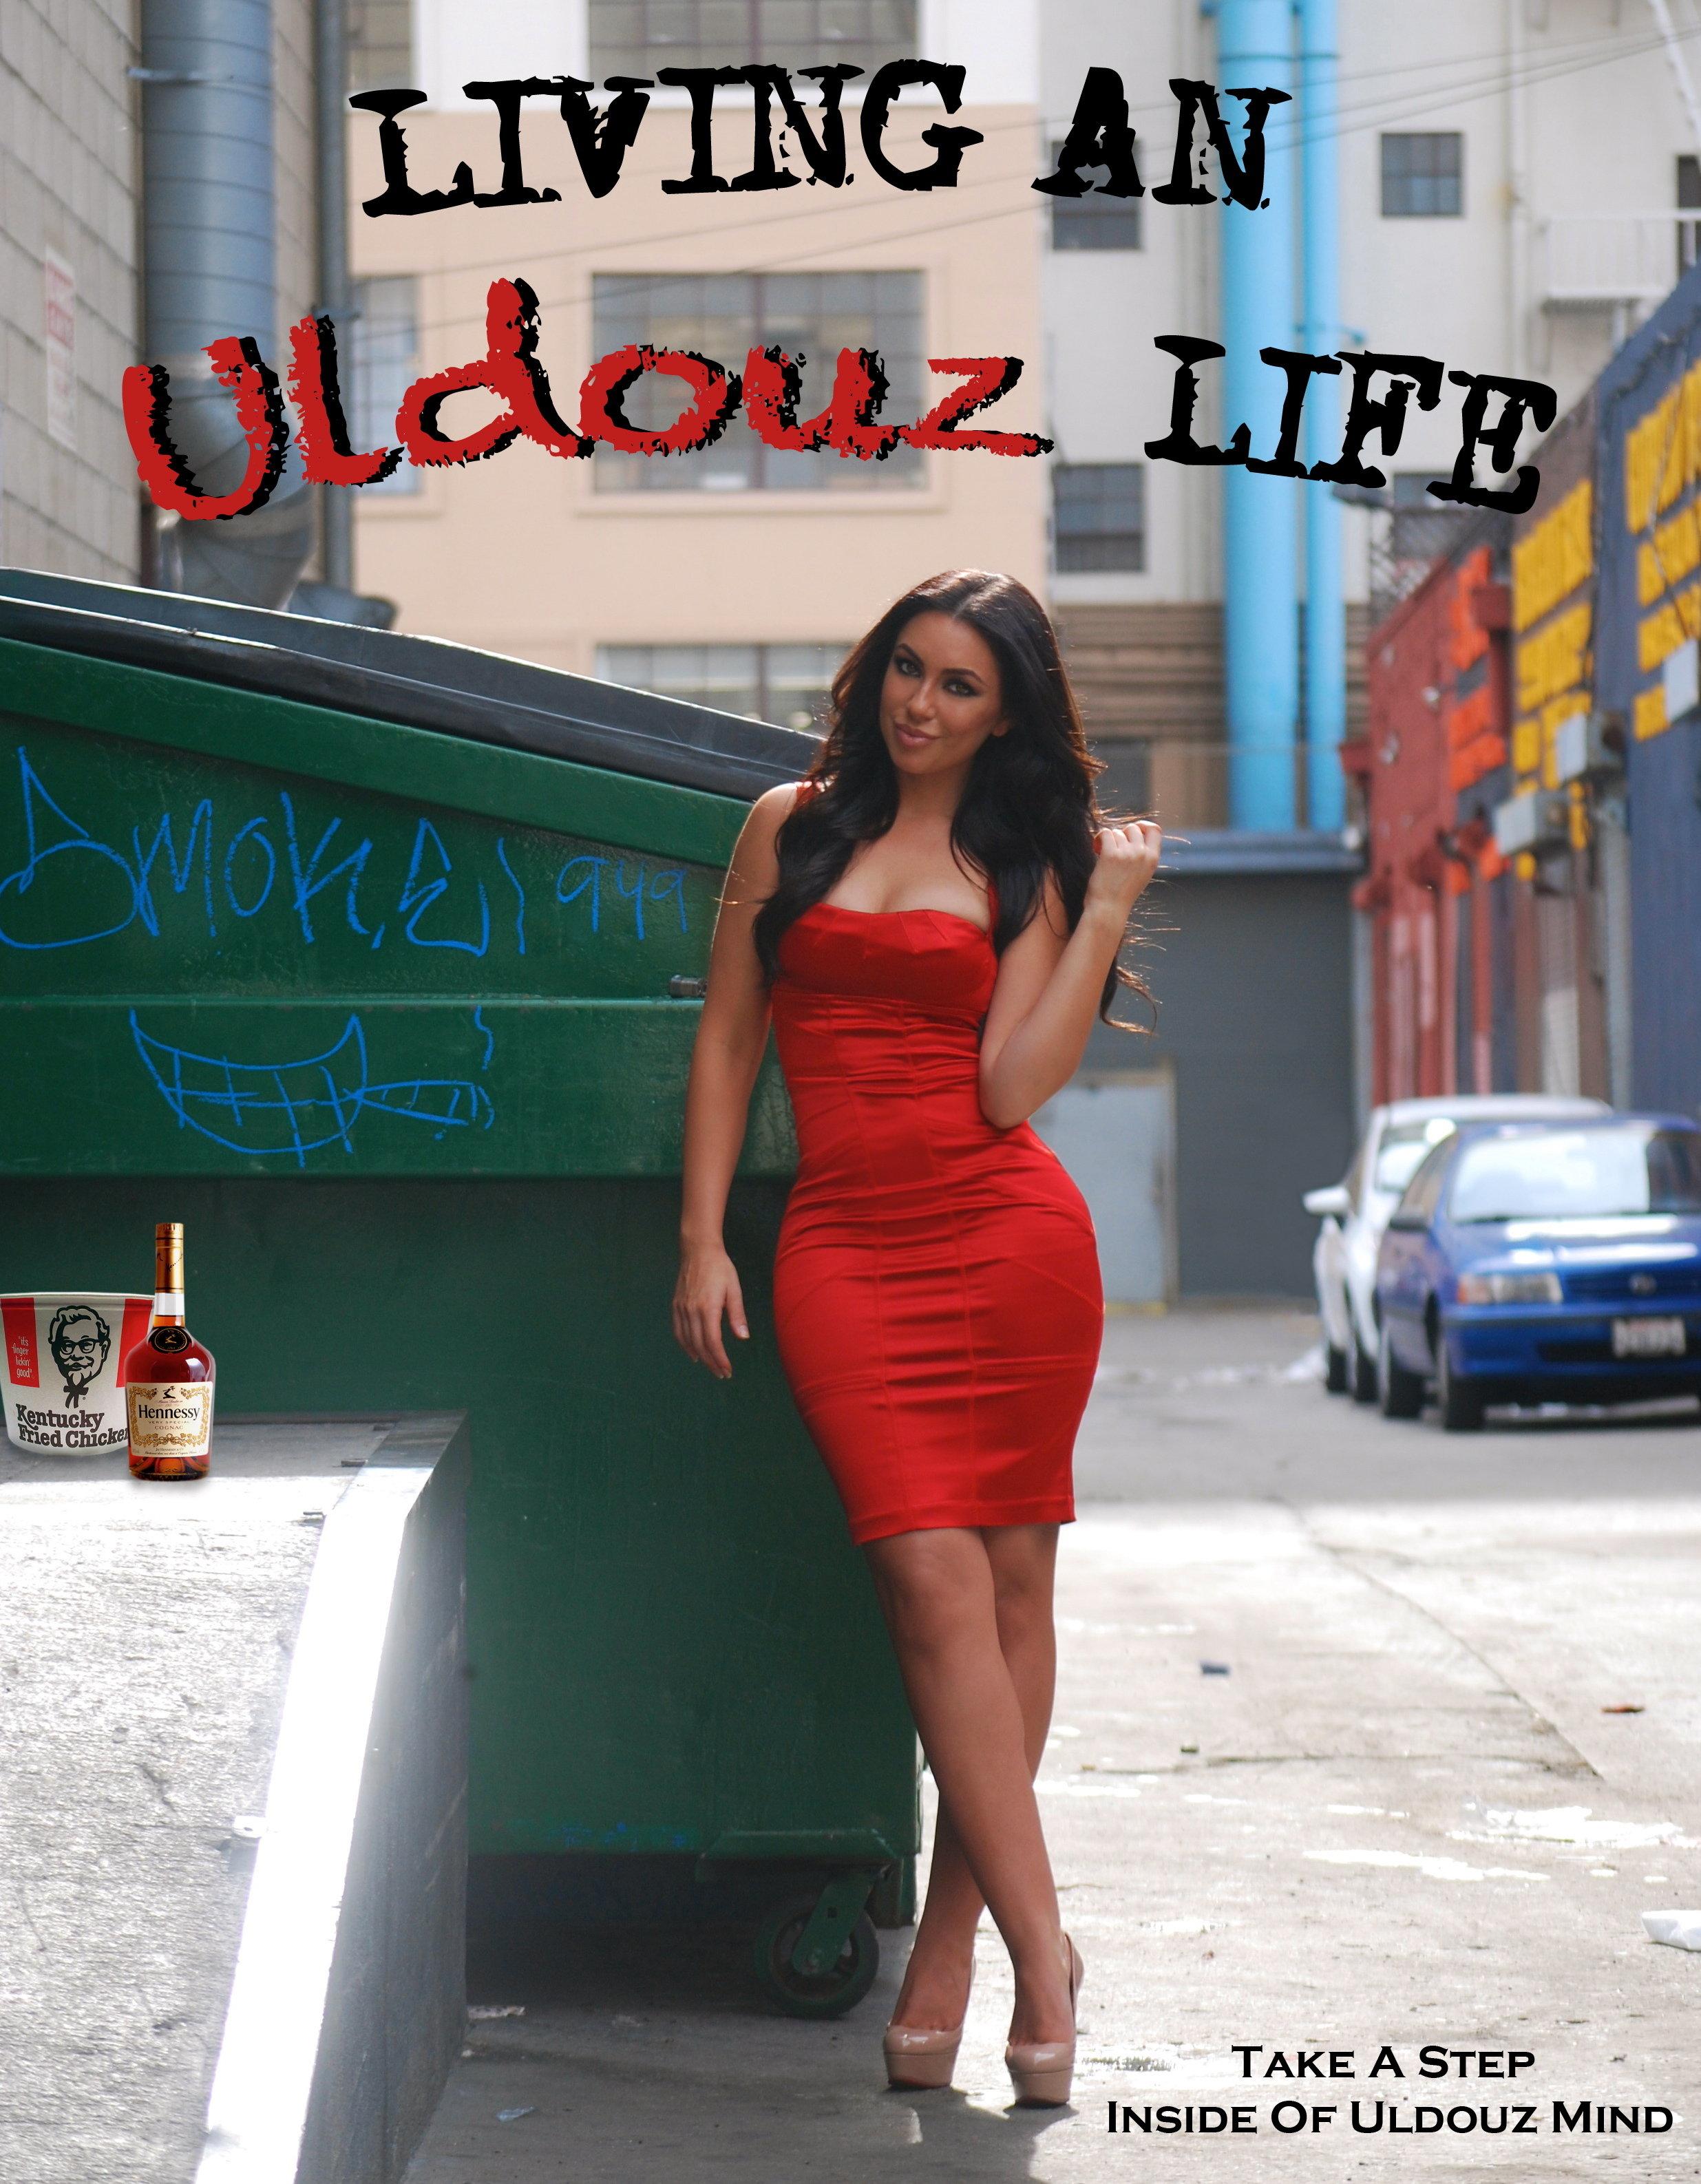 Paparazzi Uldouz Wallace nude photos 2019